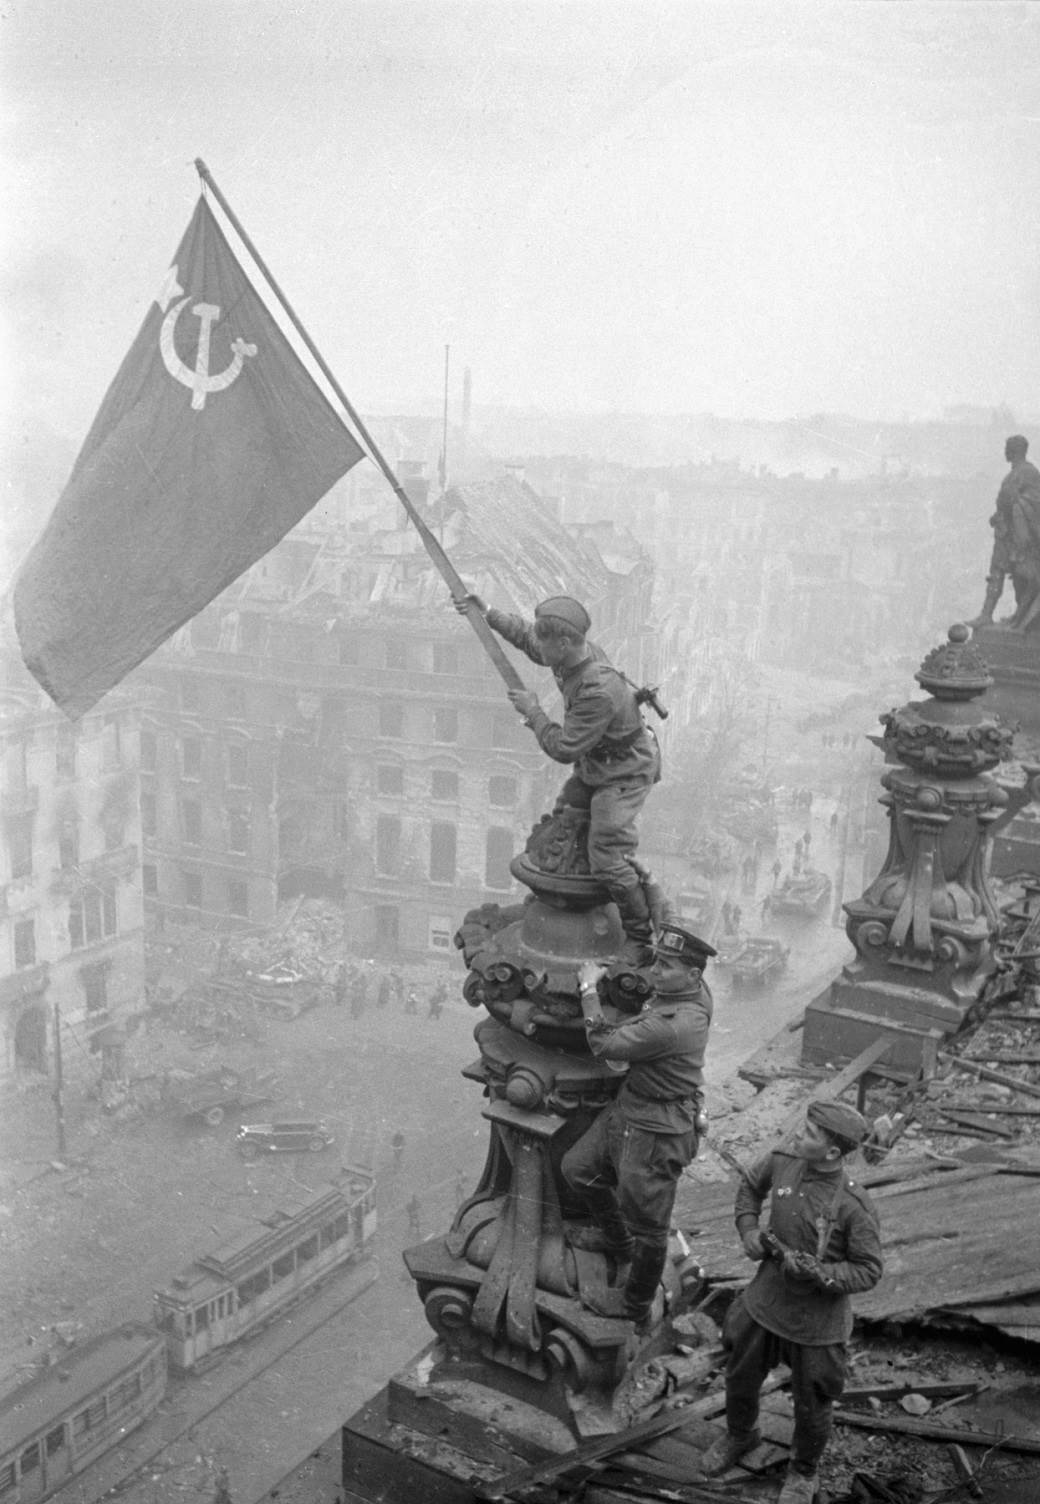 drugi svetski rat, rajhstag, rusi, zastava, berlin